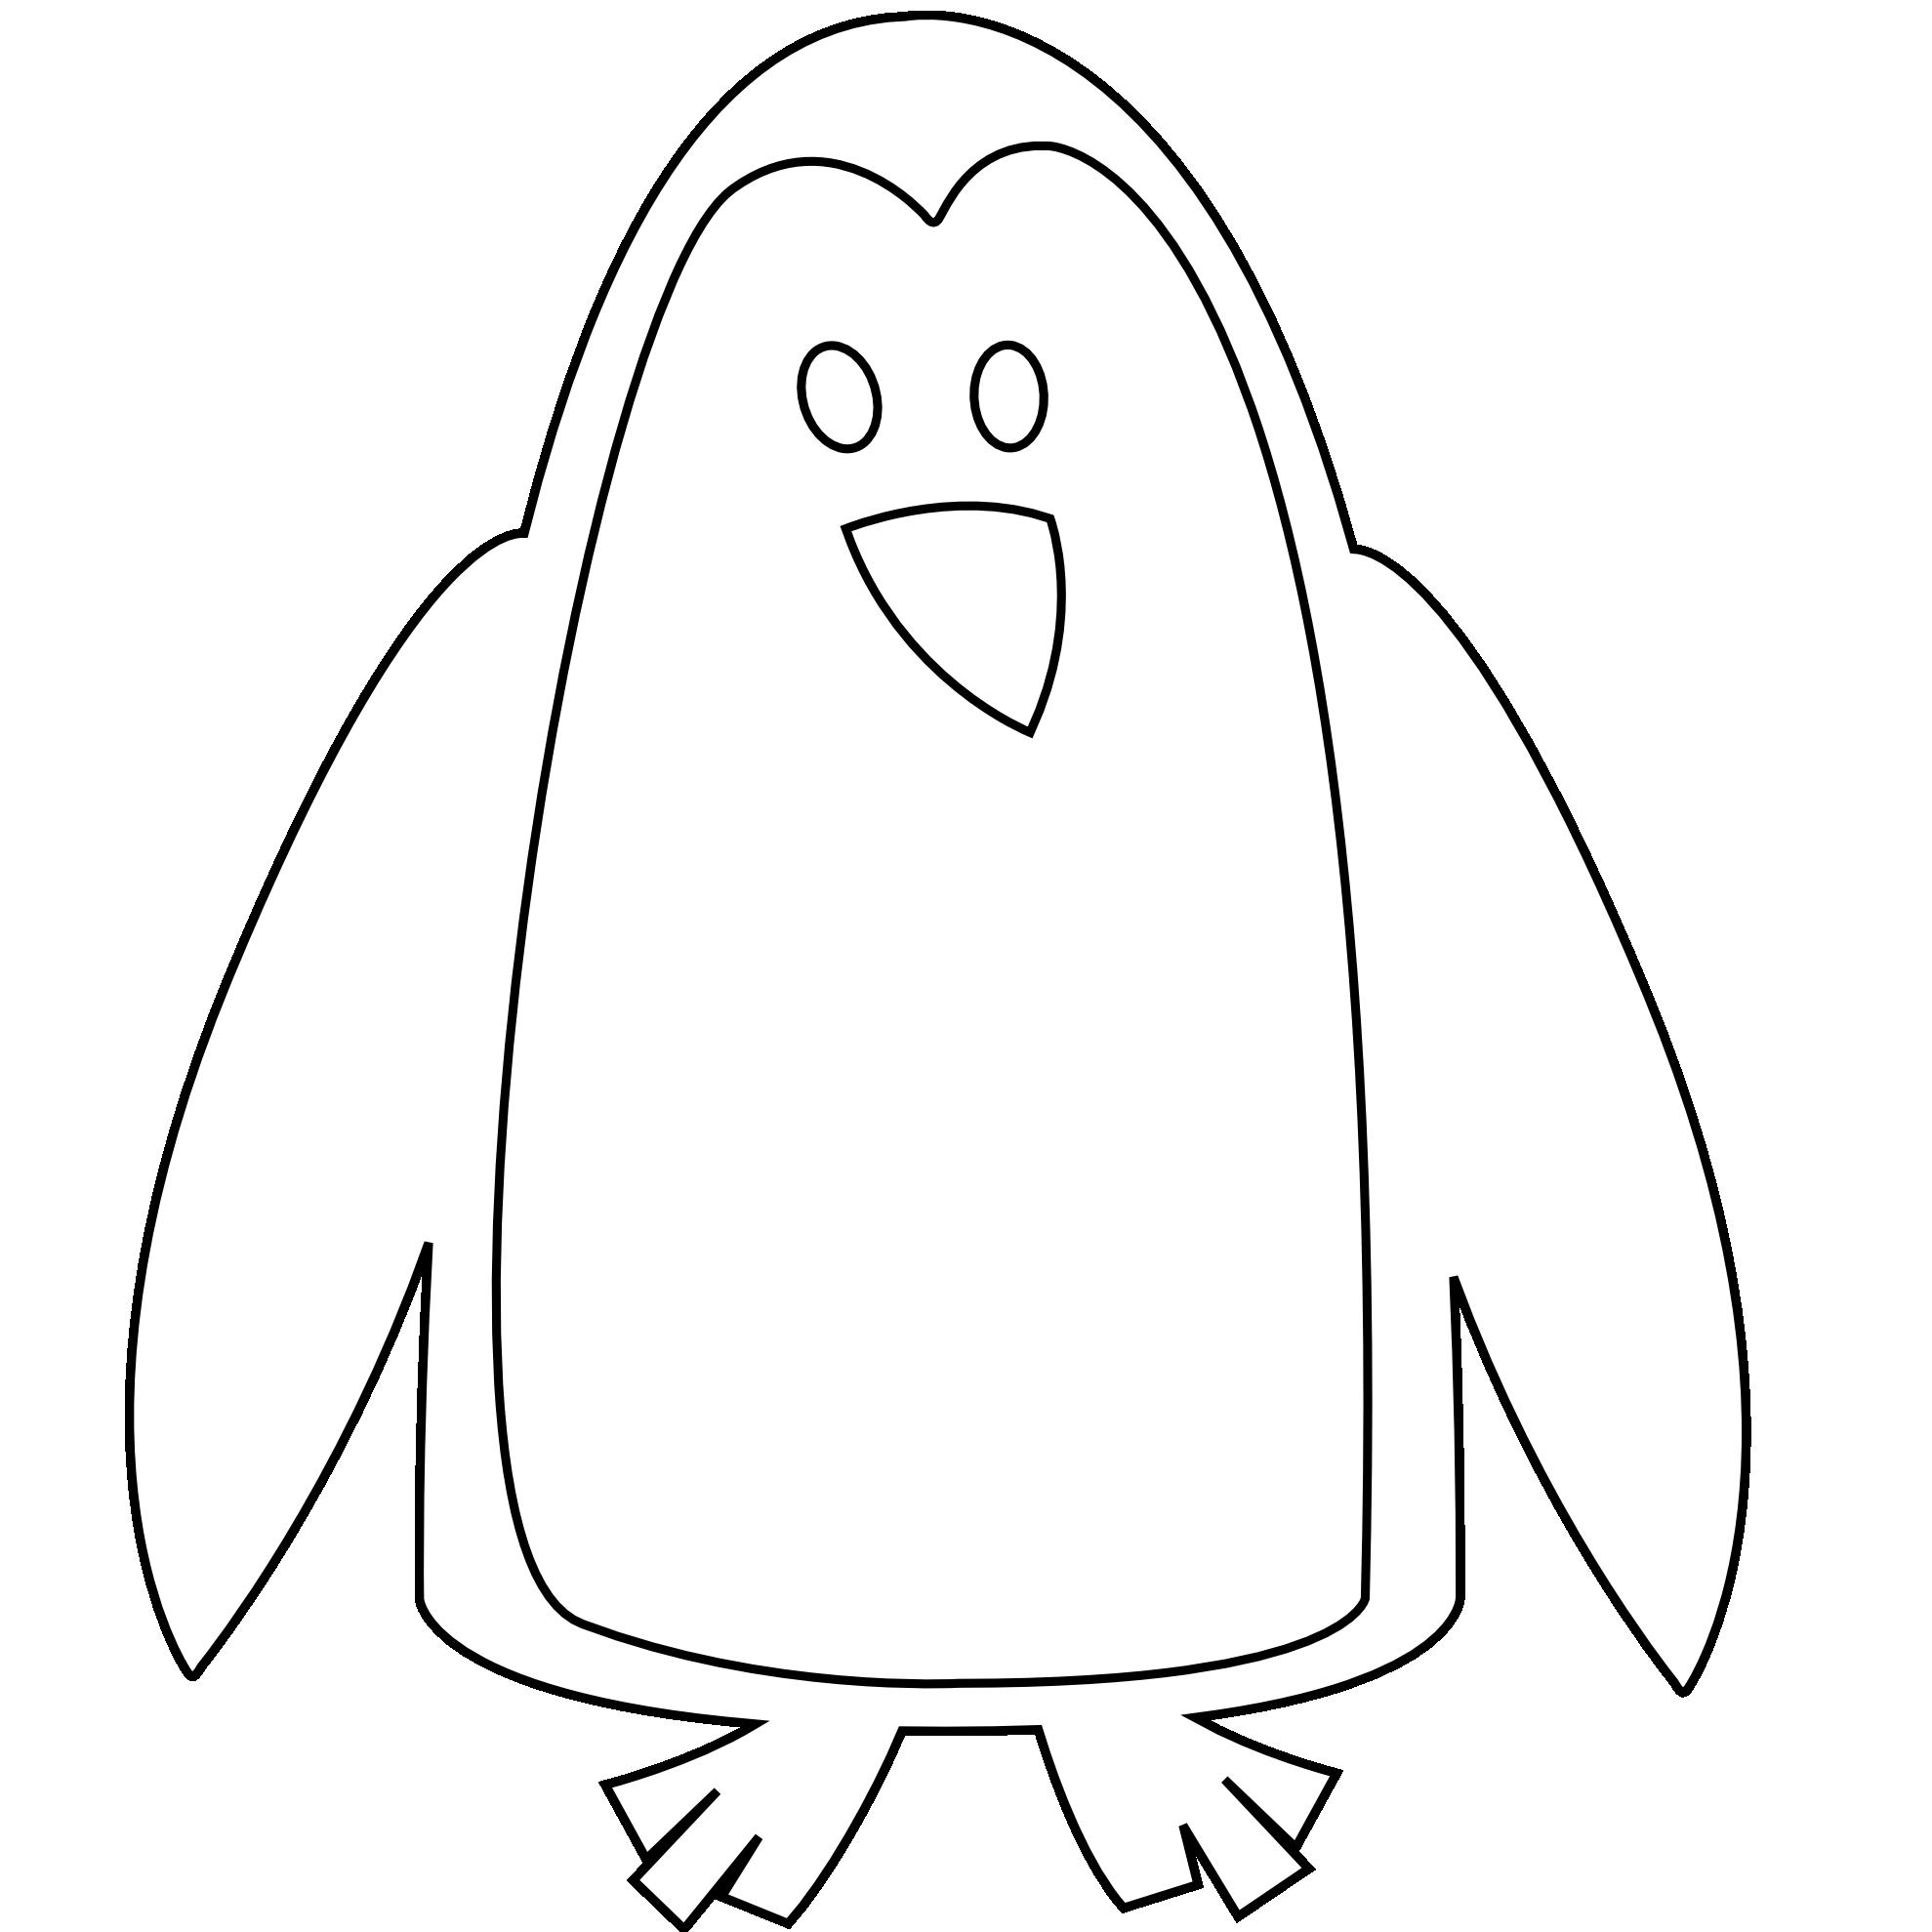 Antarctica book clipart black and white image black and white download Penguin Clipart Black And White | Clipart Panda - Free Clipart Images image black and white download